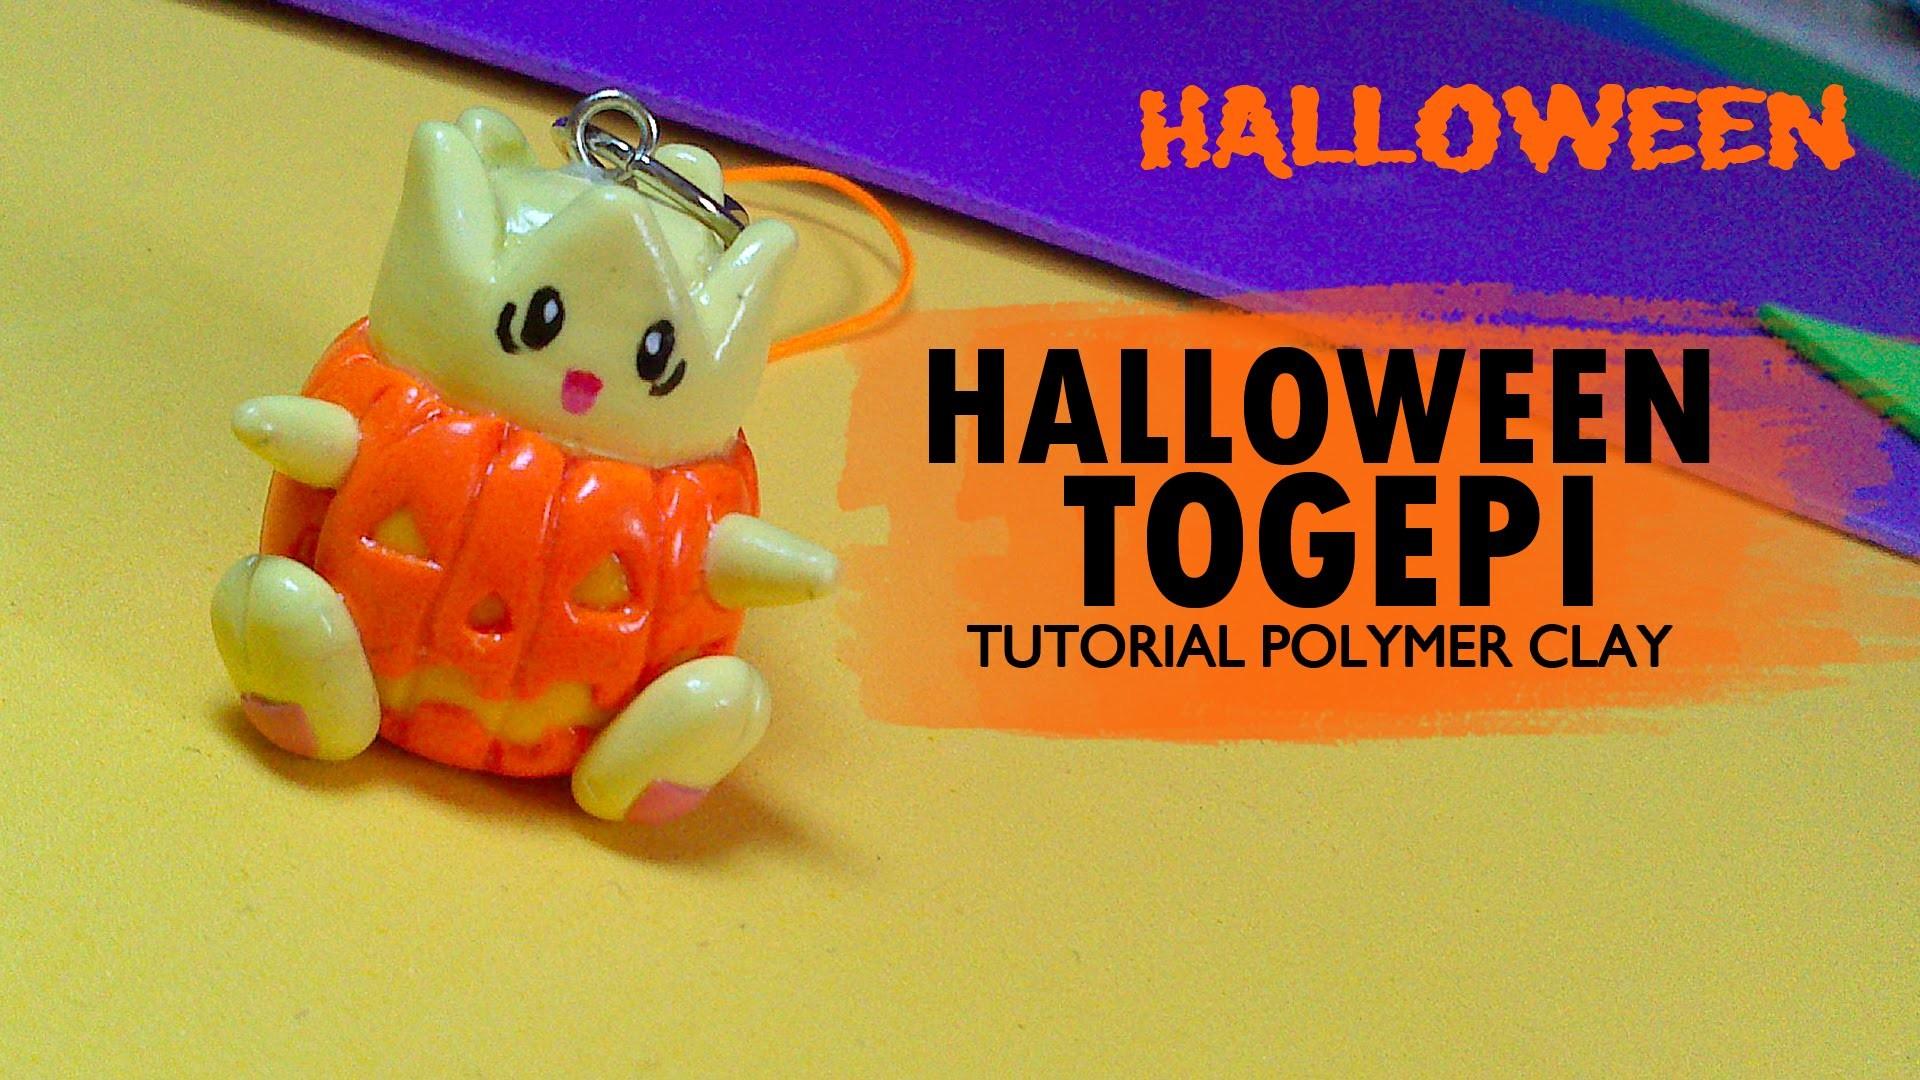 Halloween Togepi Polymer Clay Tutorial. Arcilla polimérica